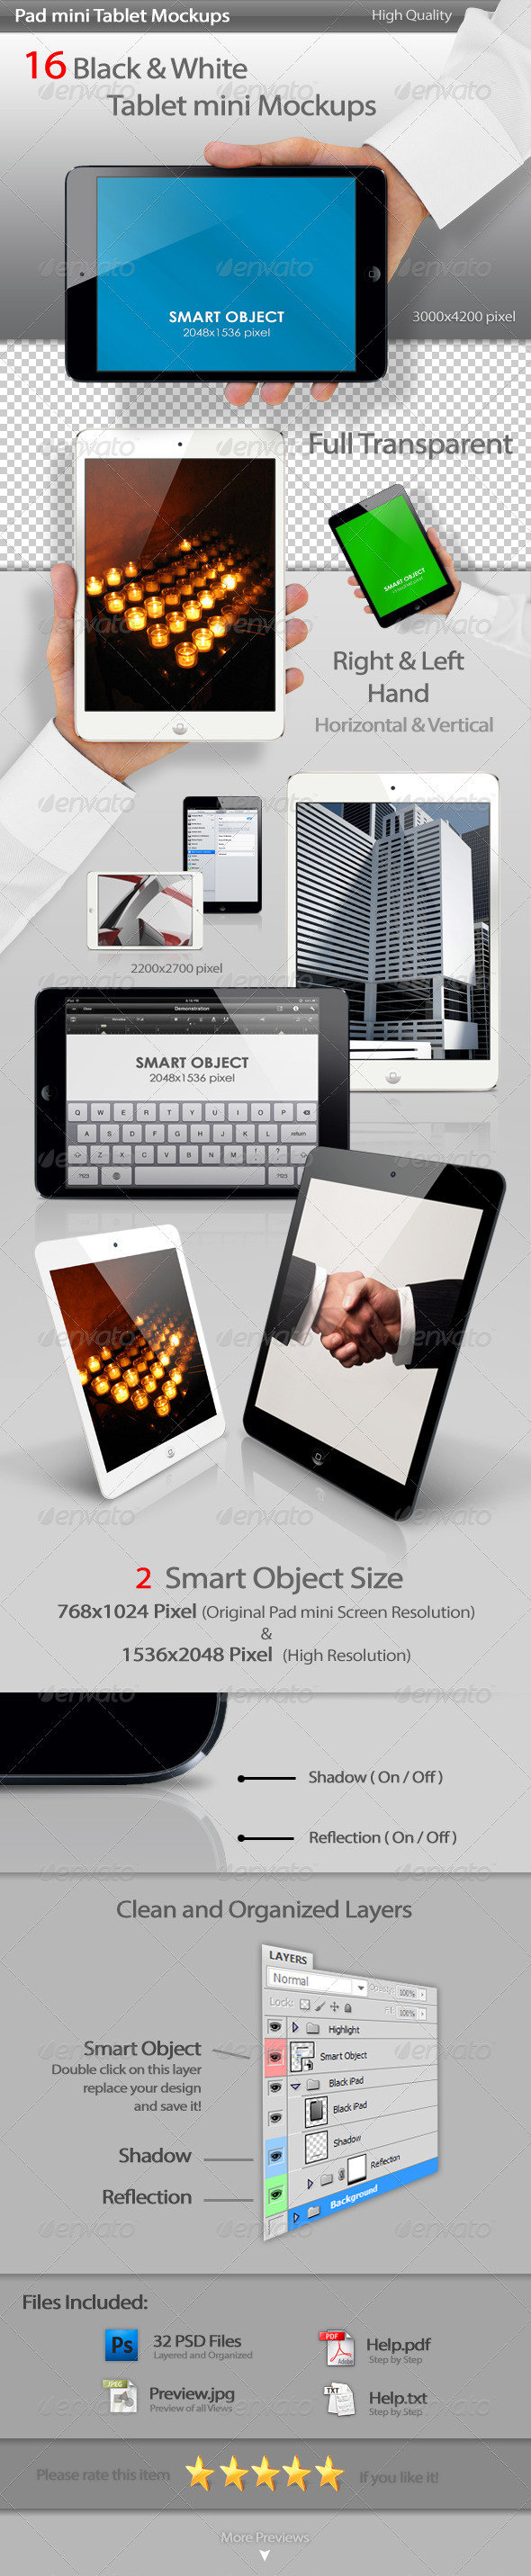 GraphicRiver Pad mini Tablet Mockups 3323856